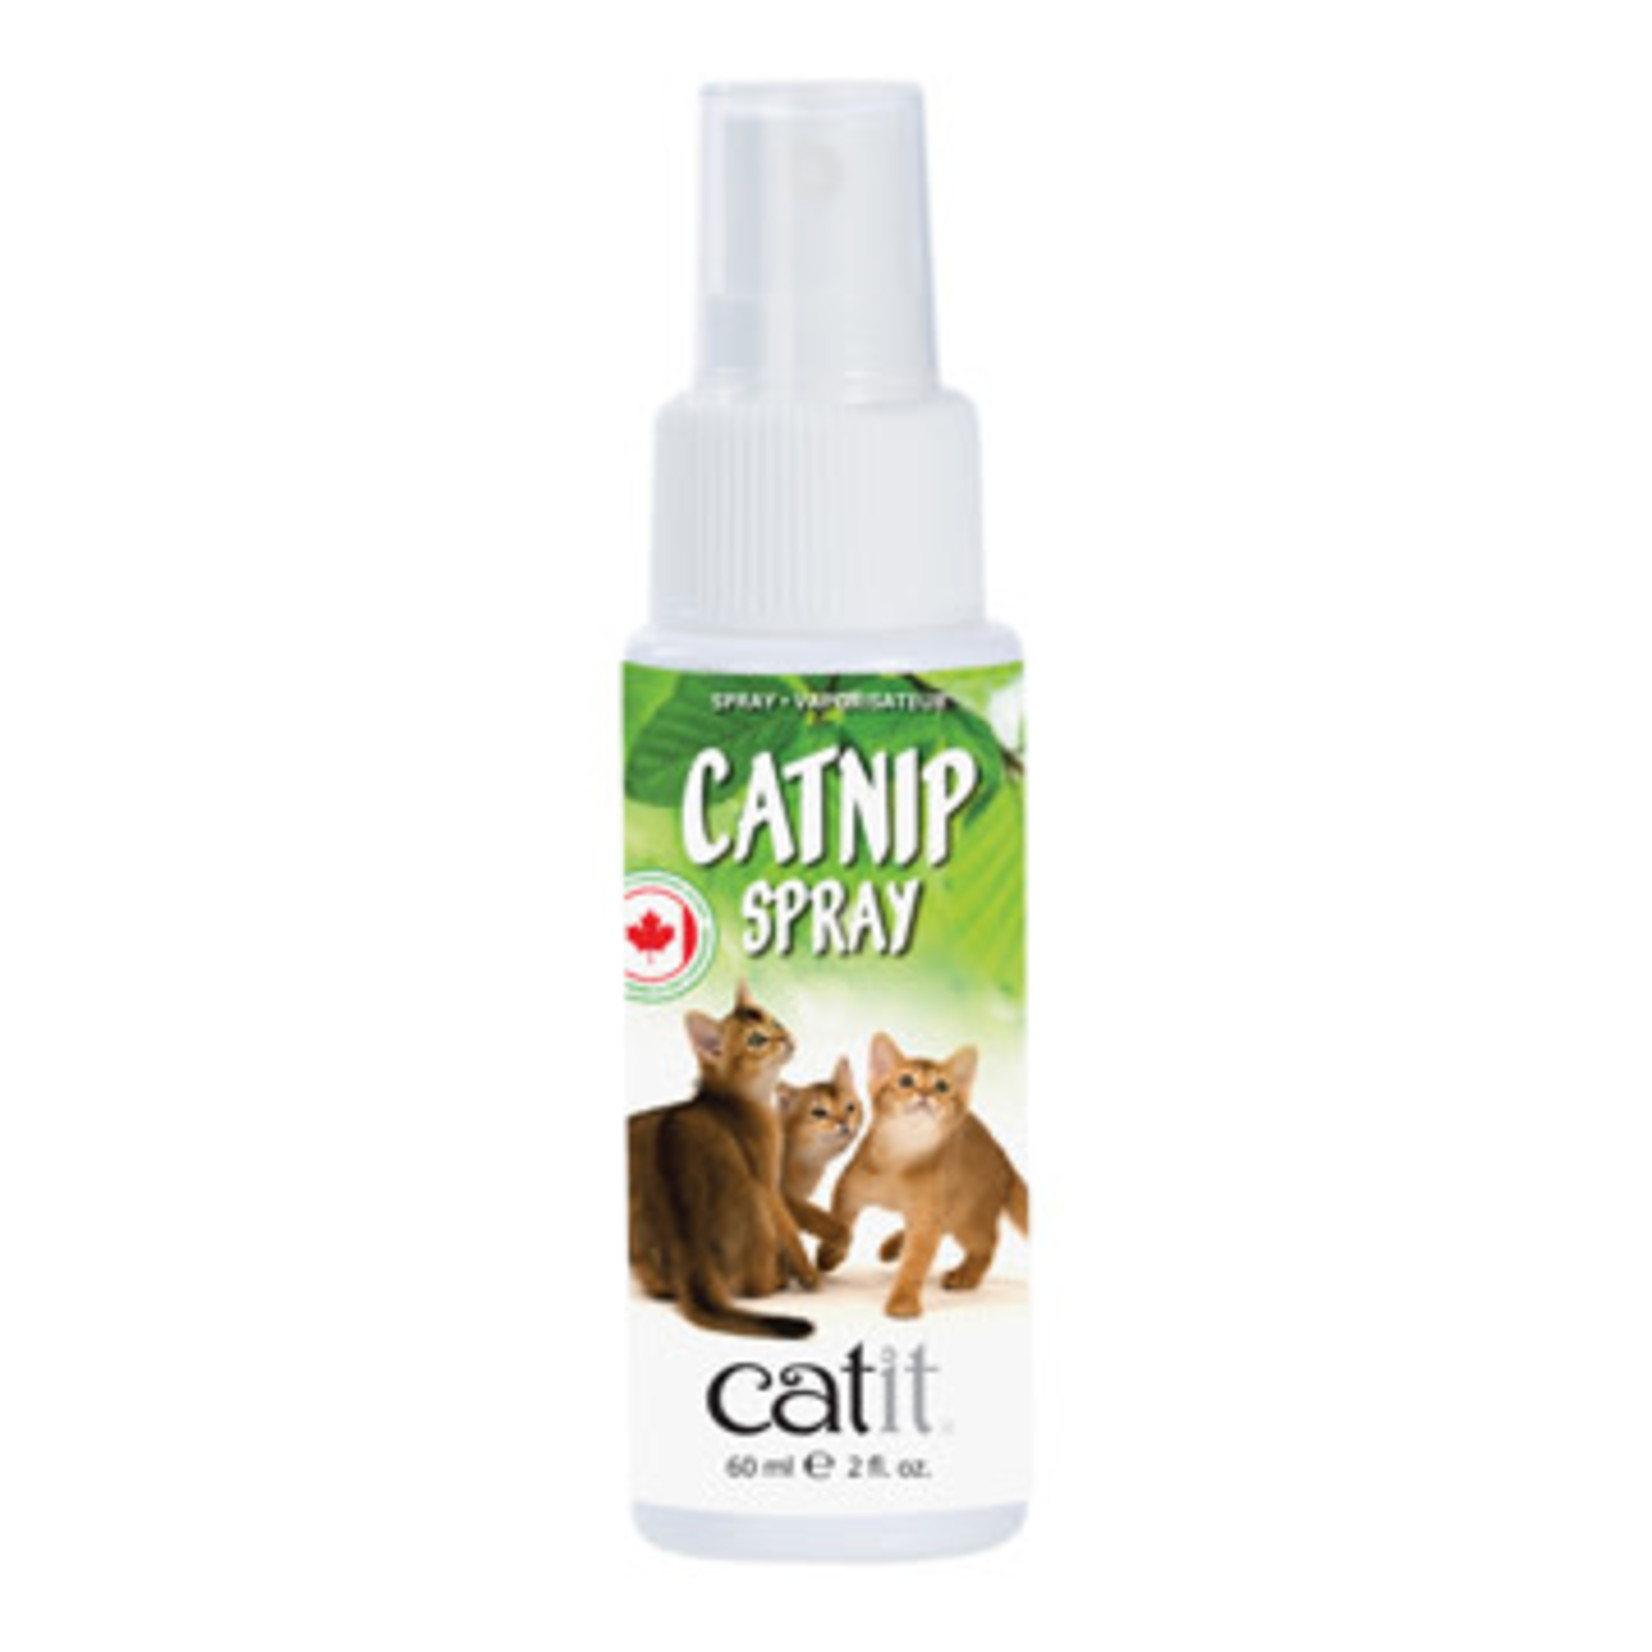 Catit catnip spray 60ml